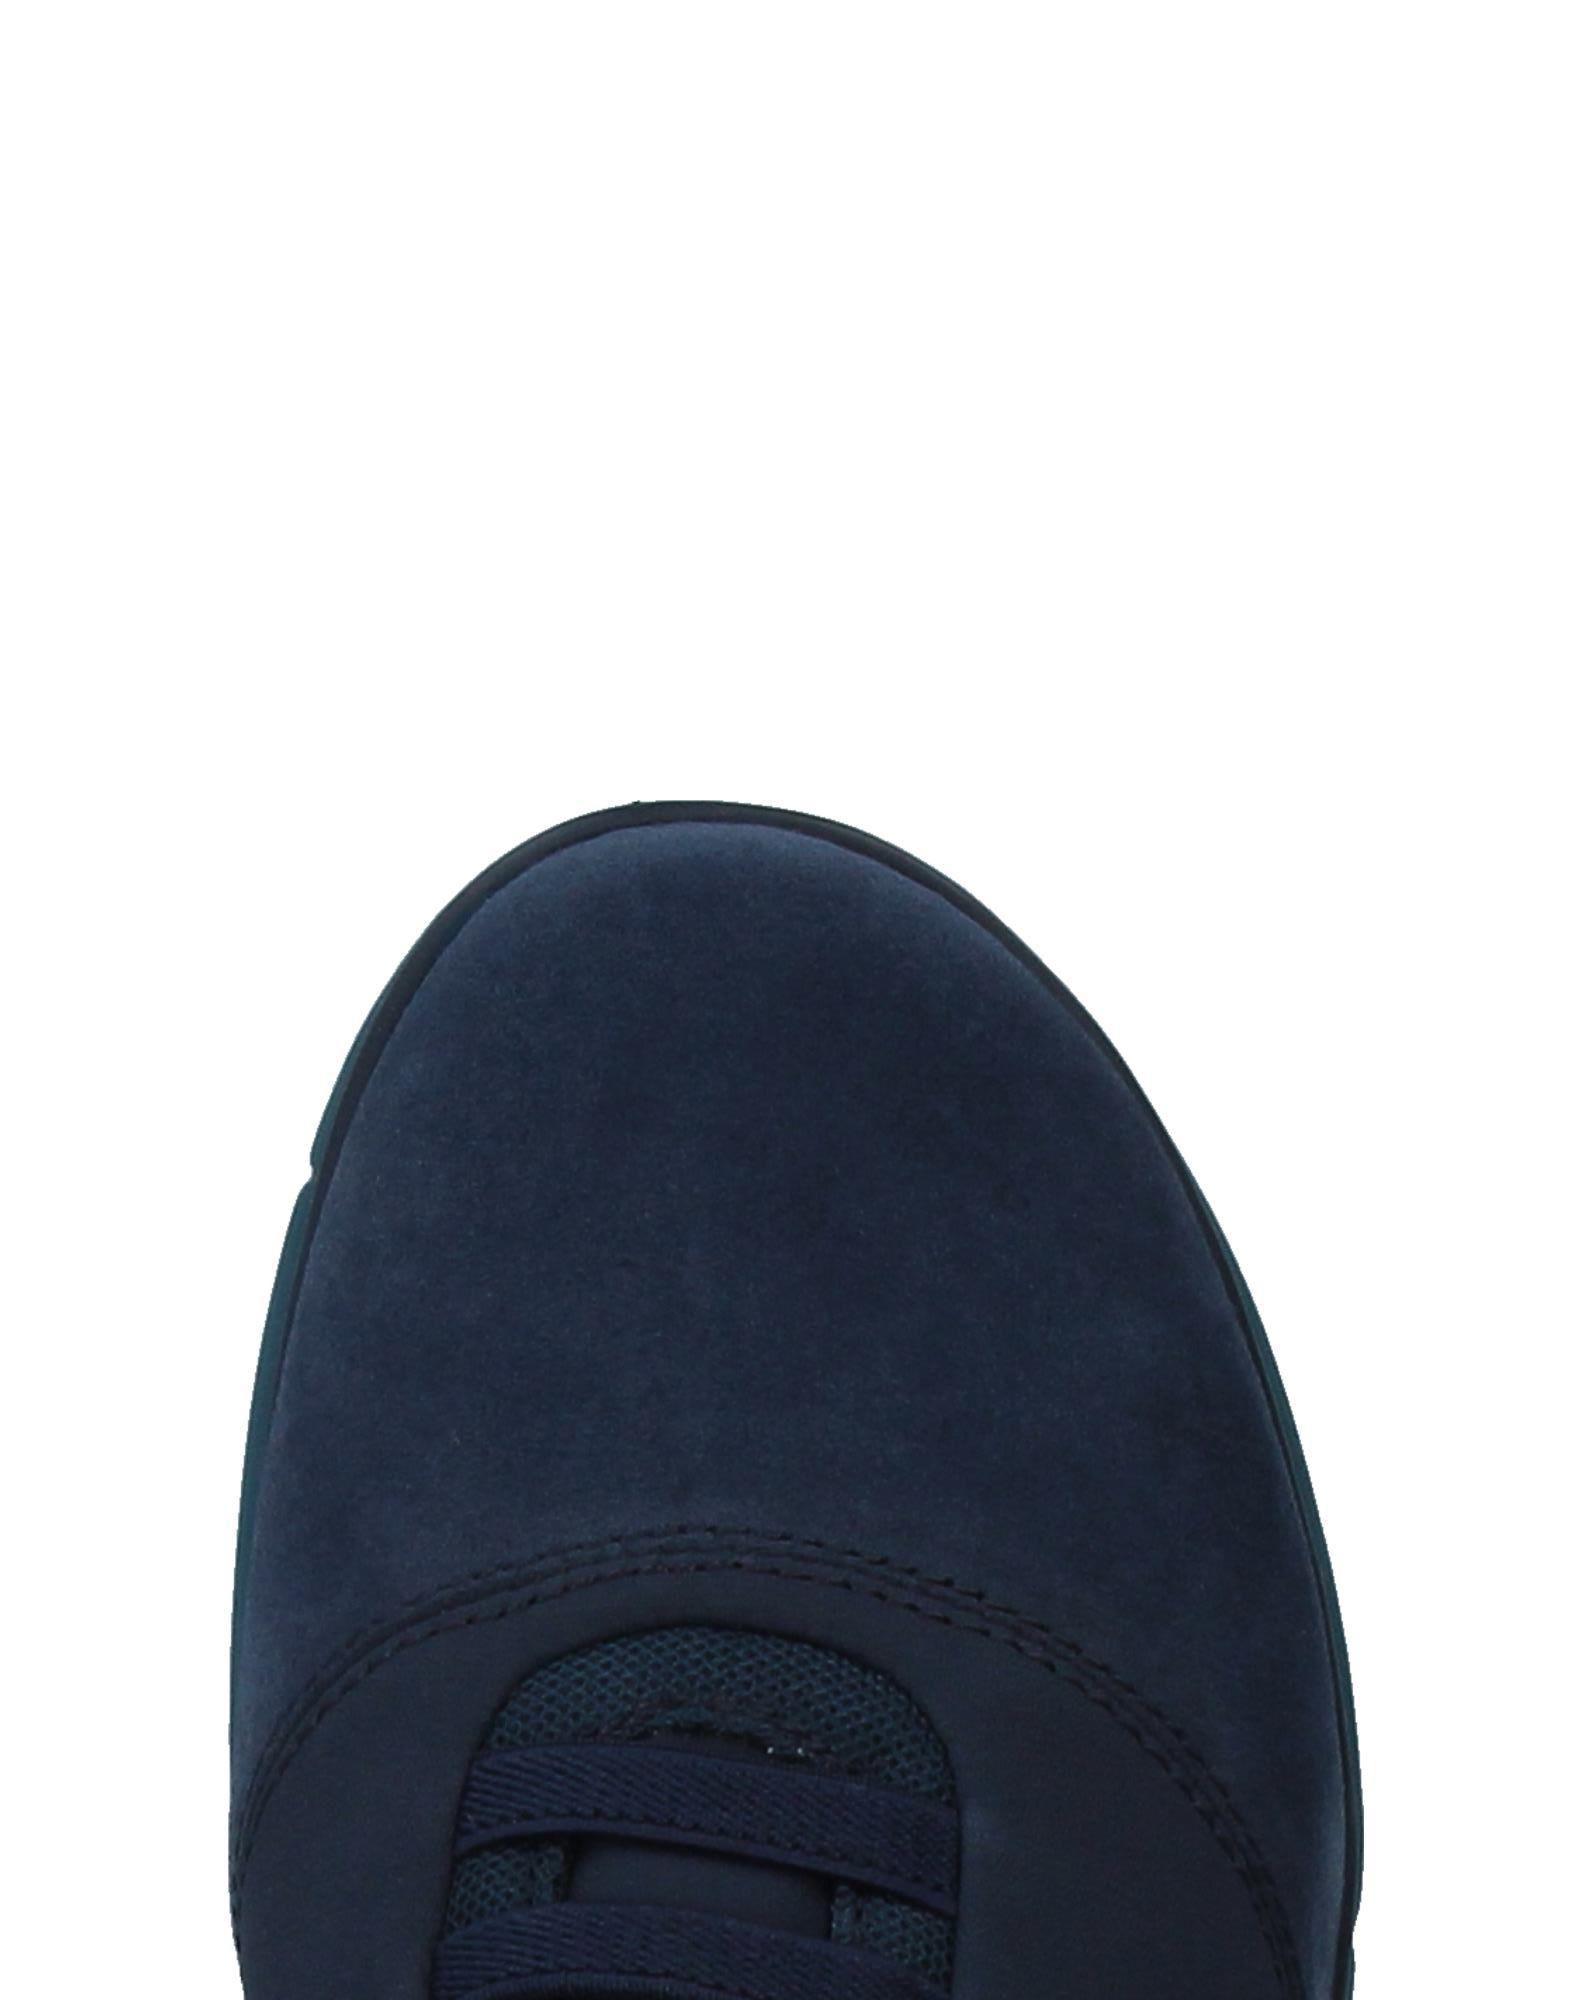 Geox Suede Low-tops & Sneakers in Slate Blue (Blue)